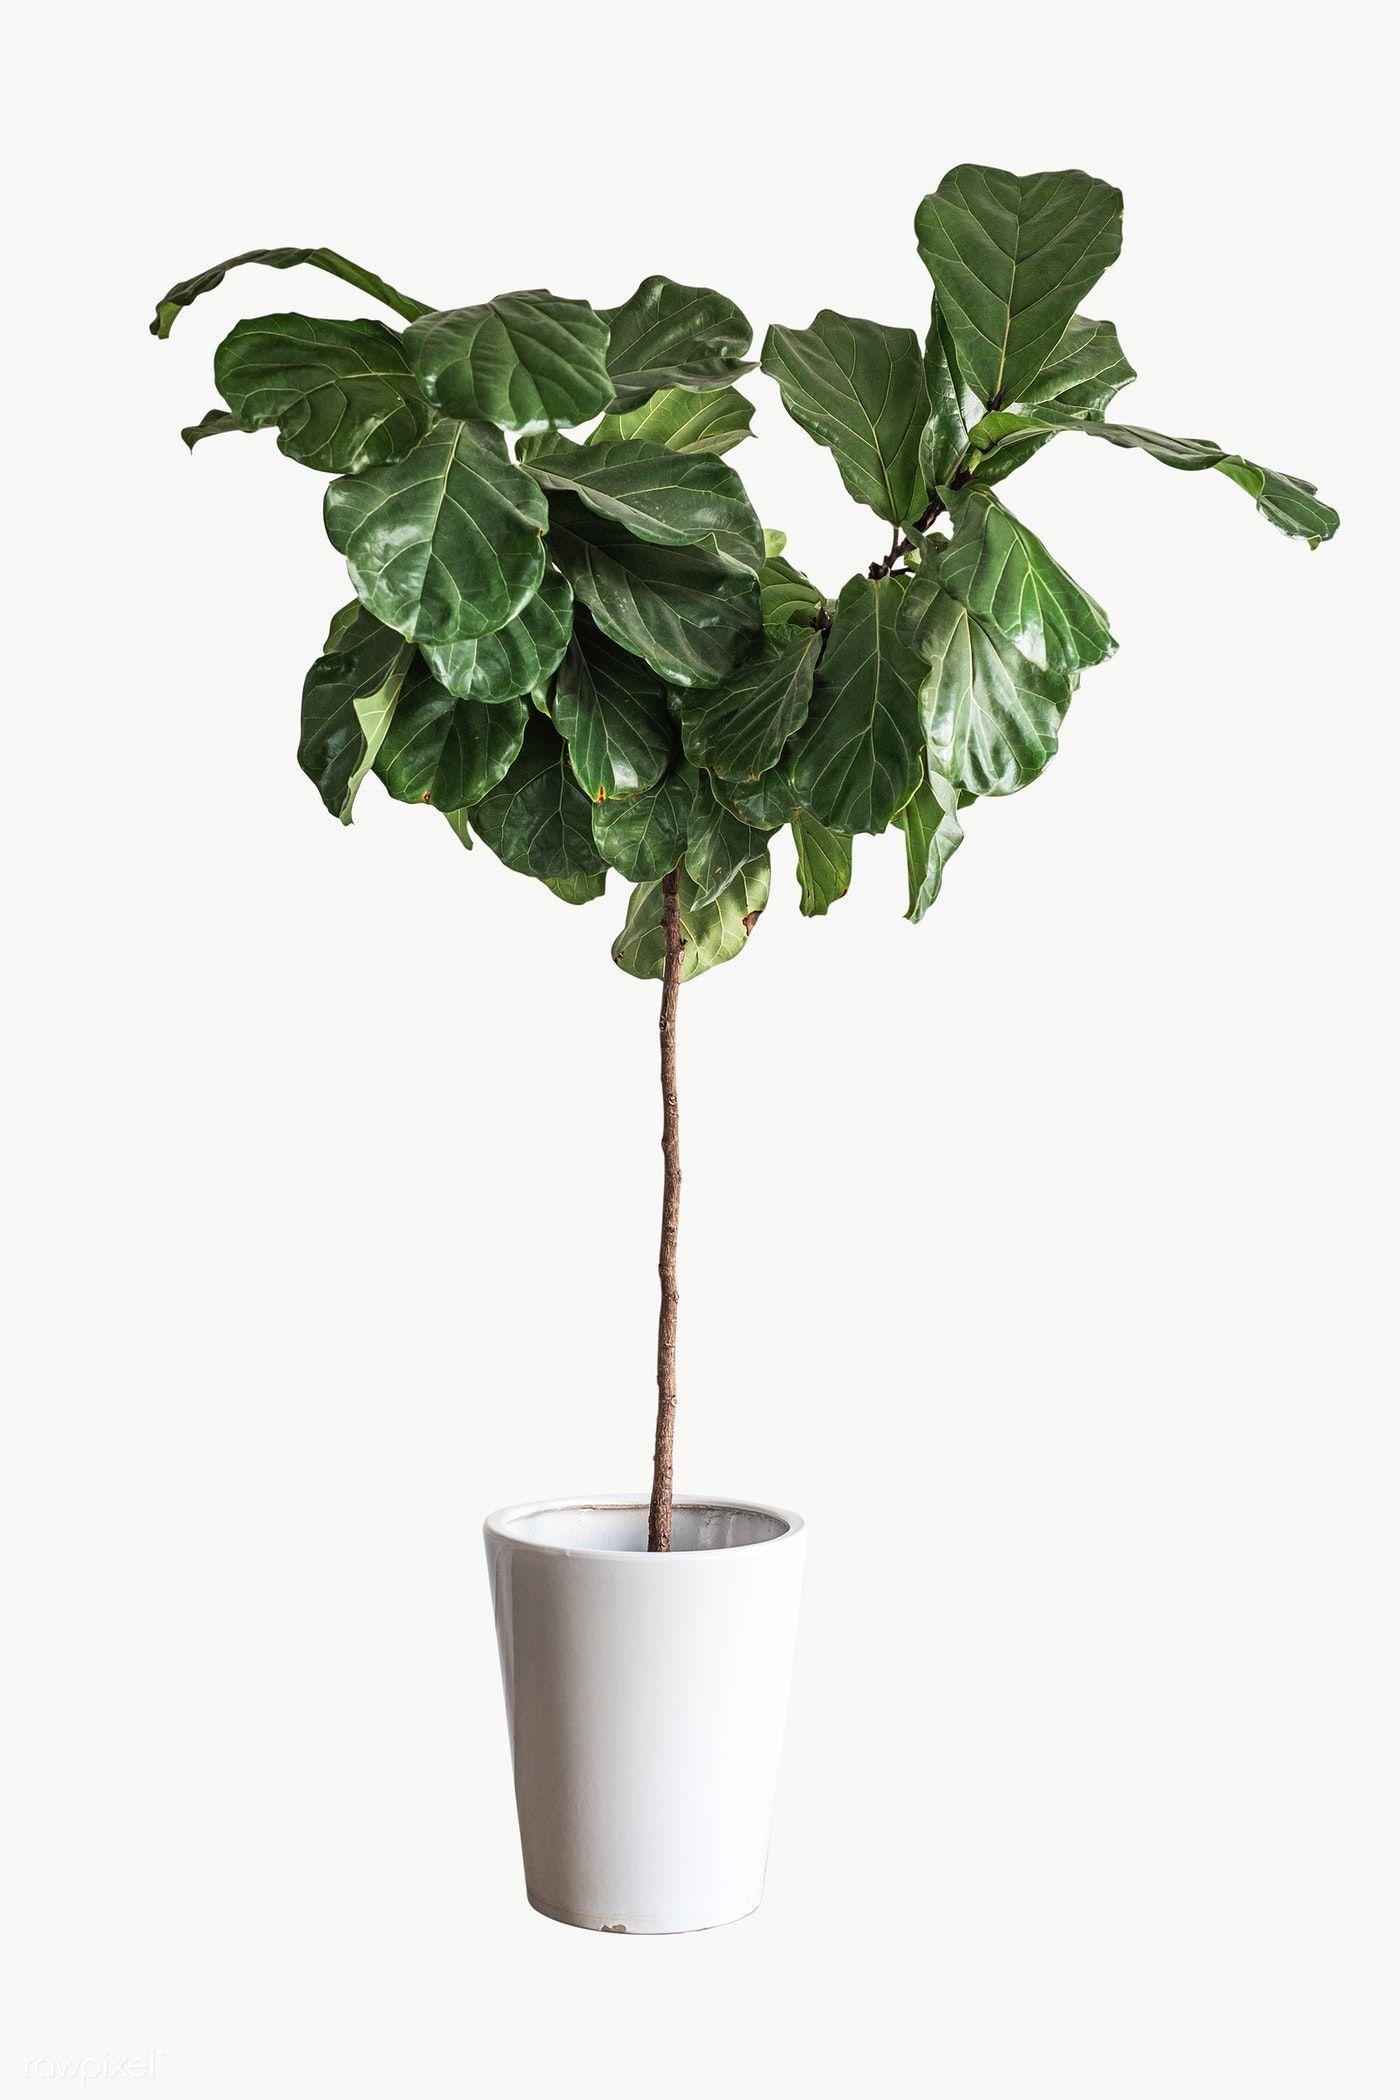 Green Plant For Decoration On White Premium Image By Rawpixel Com Felix Plants Green Plants House Plants Decor